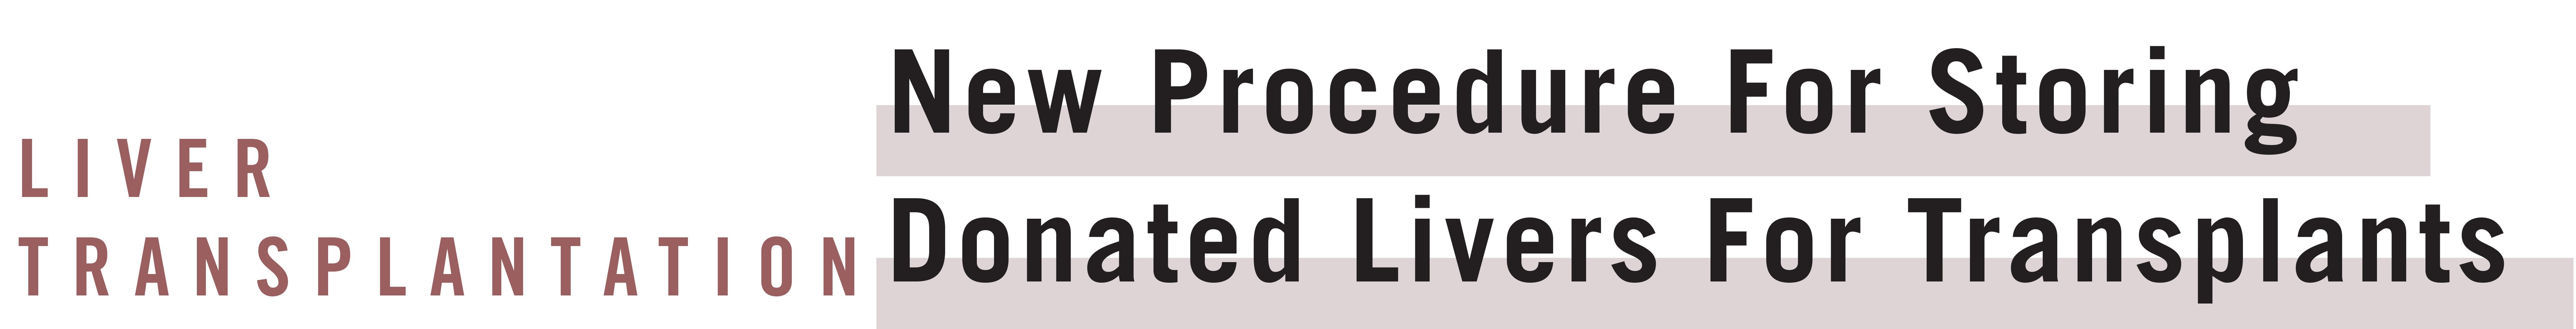 New Liver Transplantation Procedure